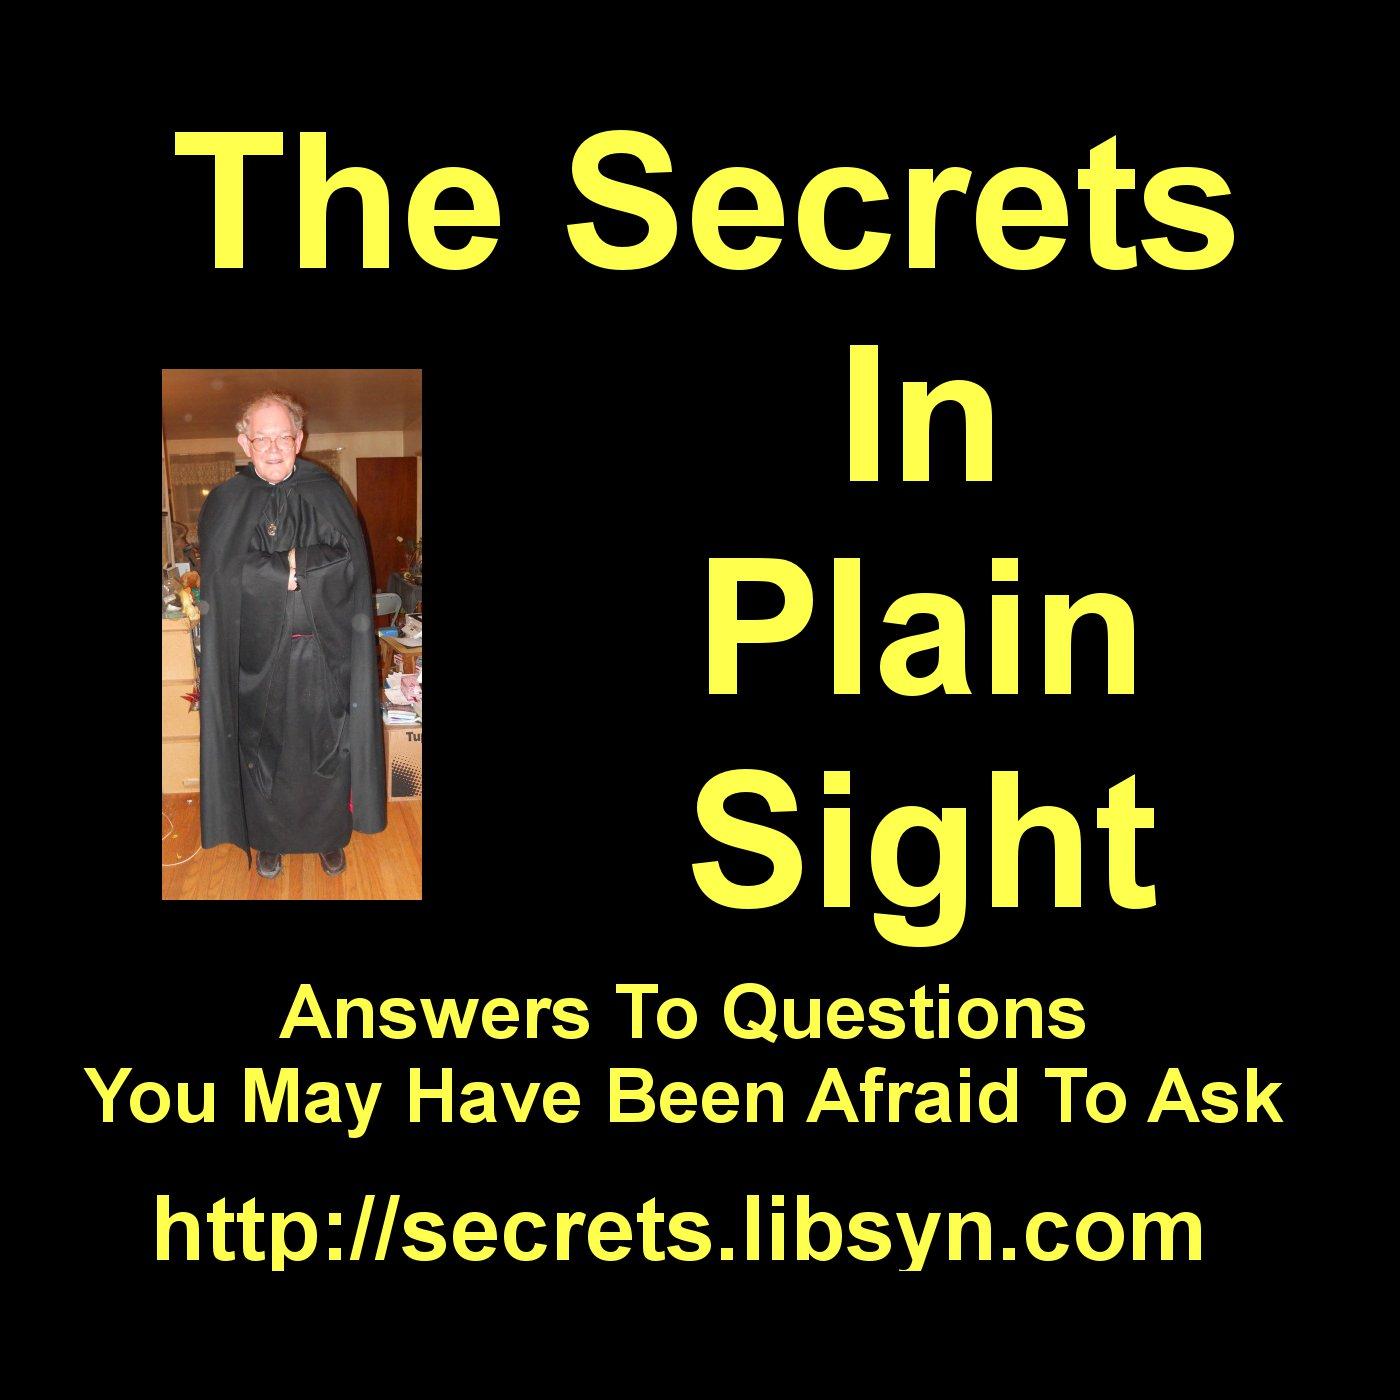 The Secrets In Plain Sight!